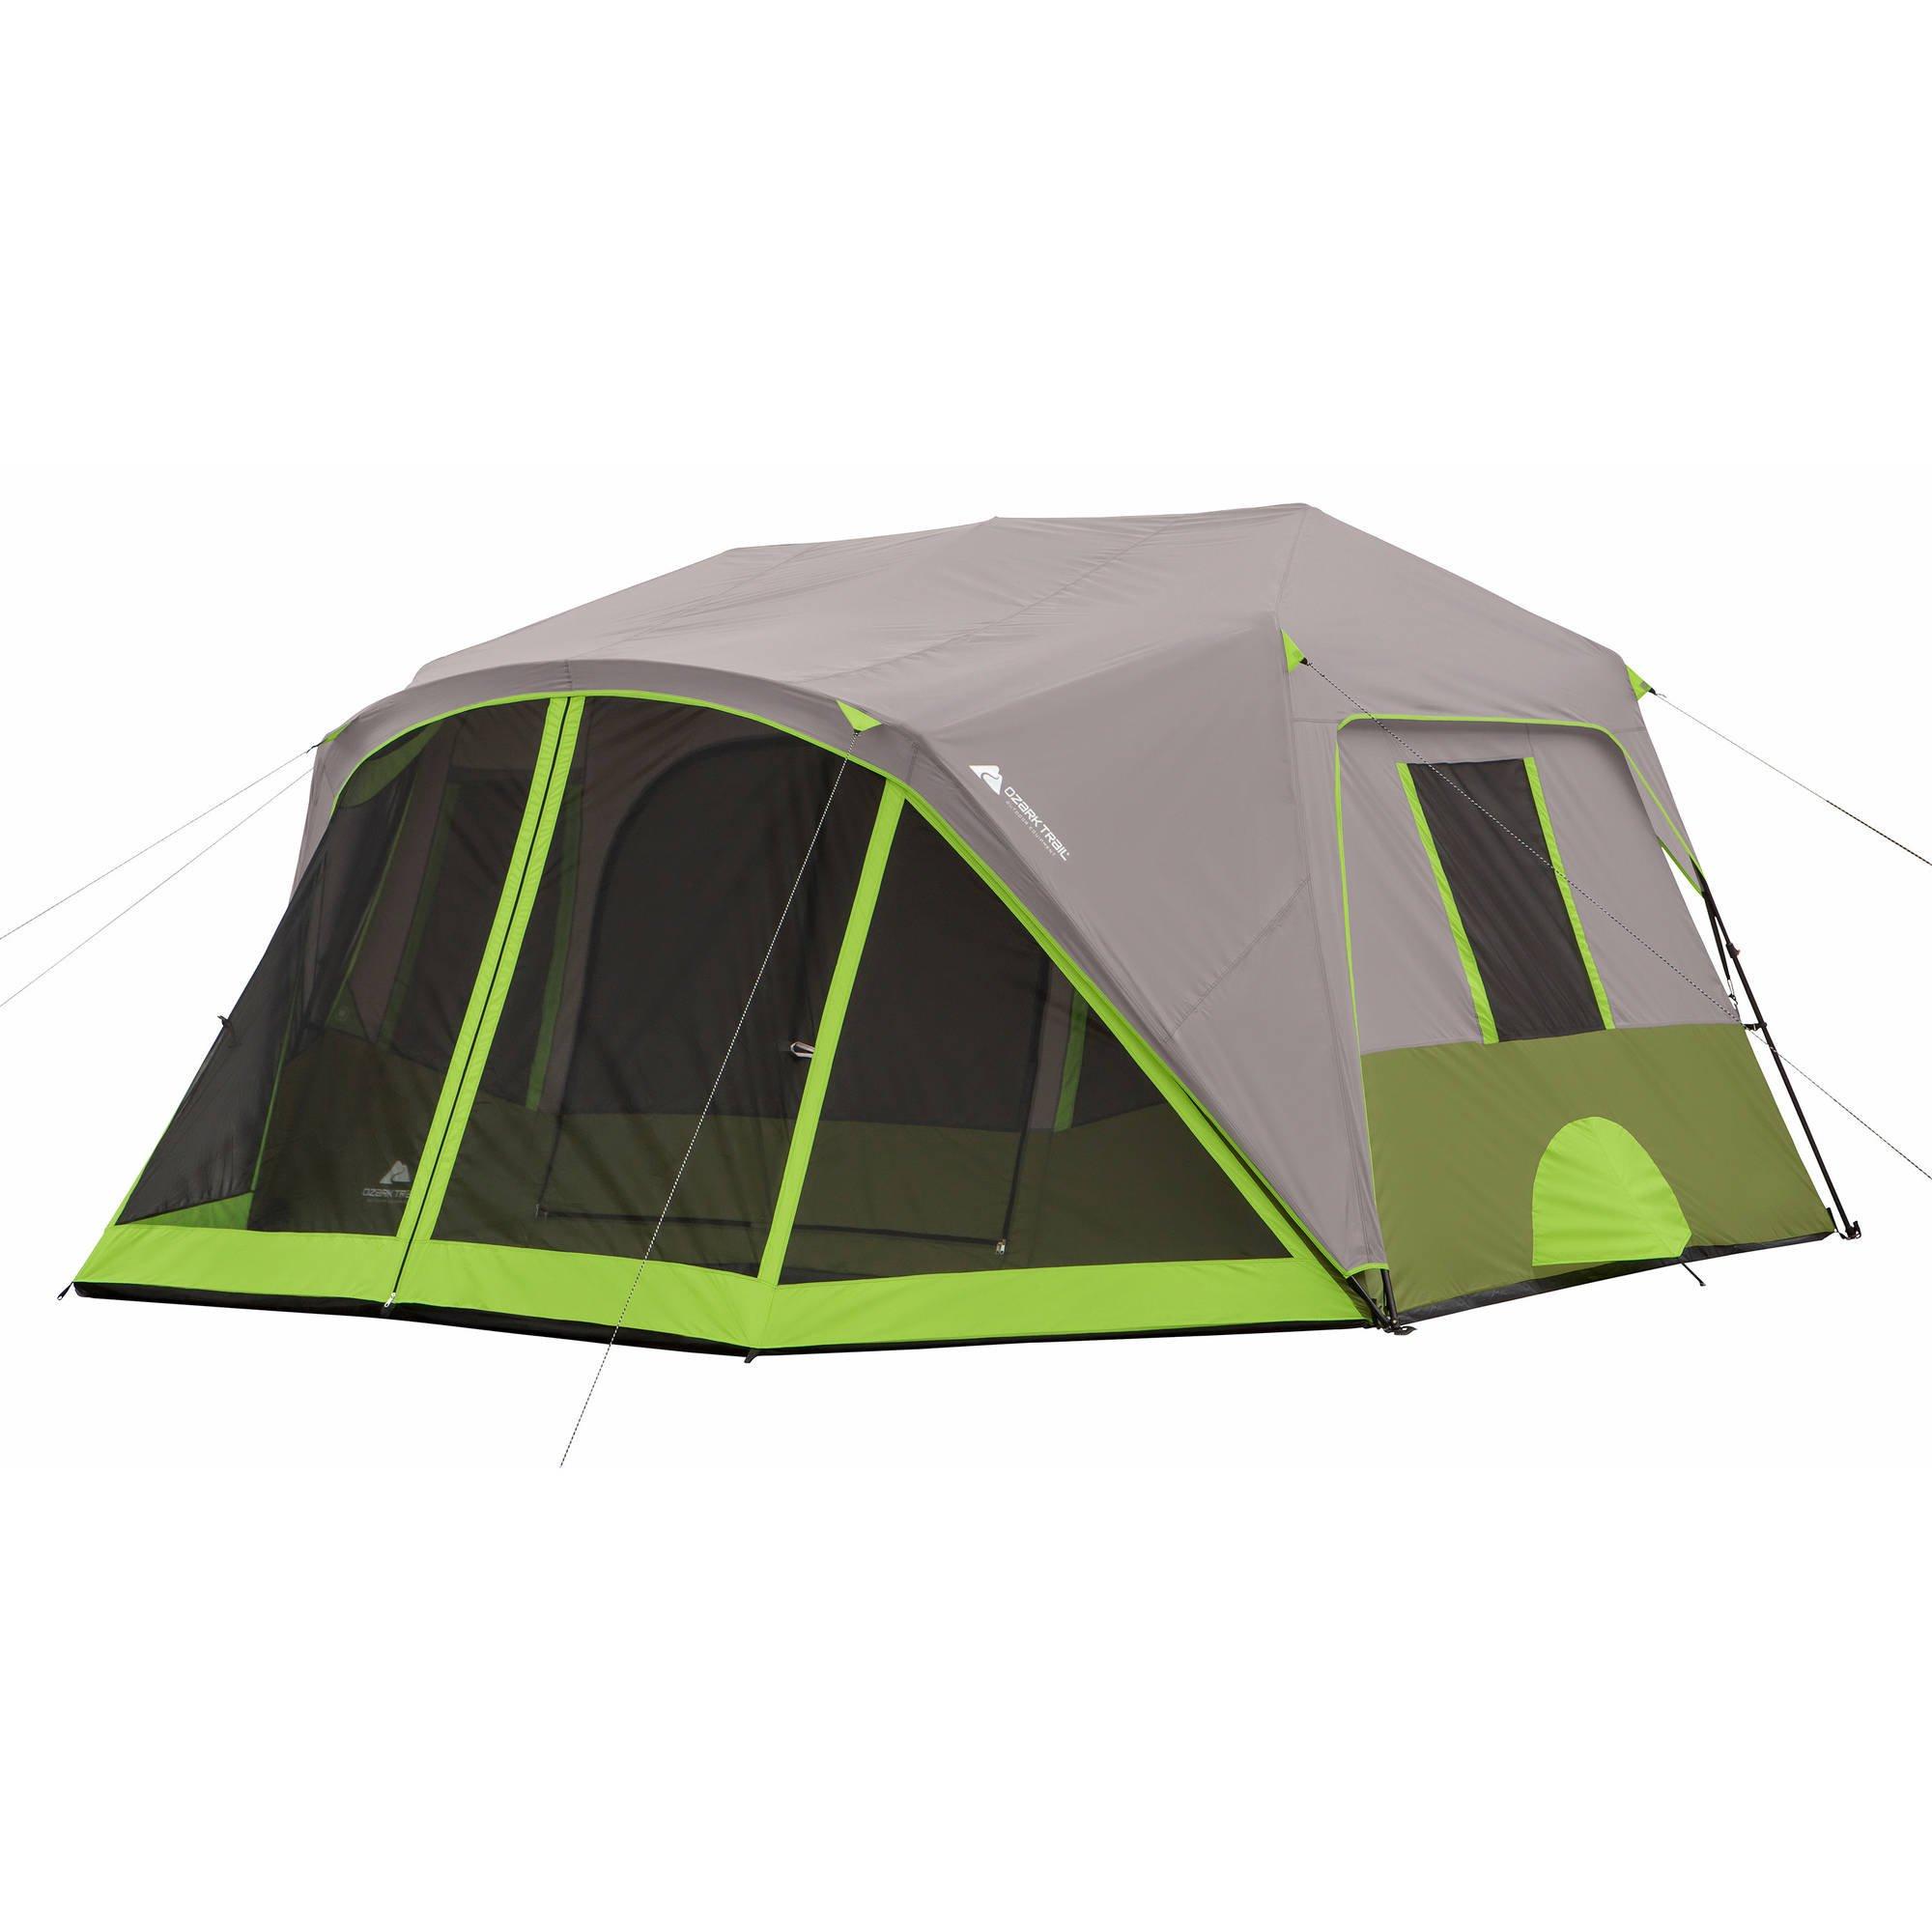 Ozark Trail 9 Person Instant Cabin Tent With 2 Bonus Queen